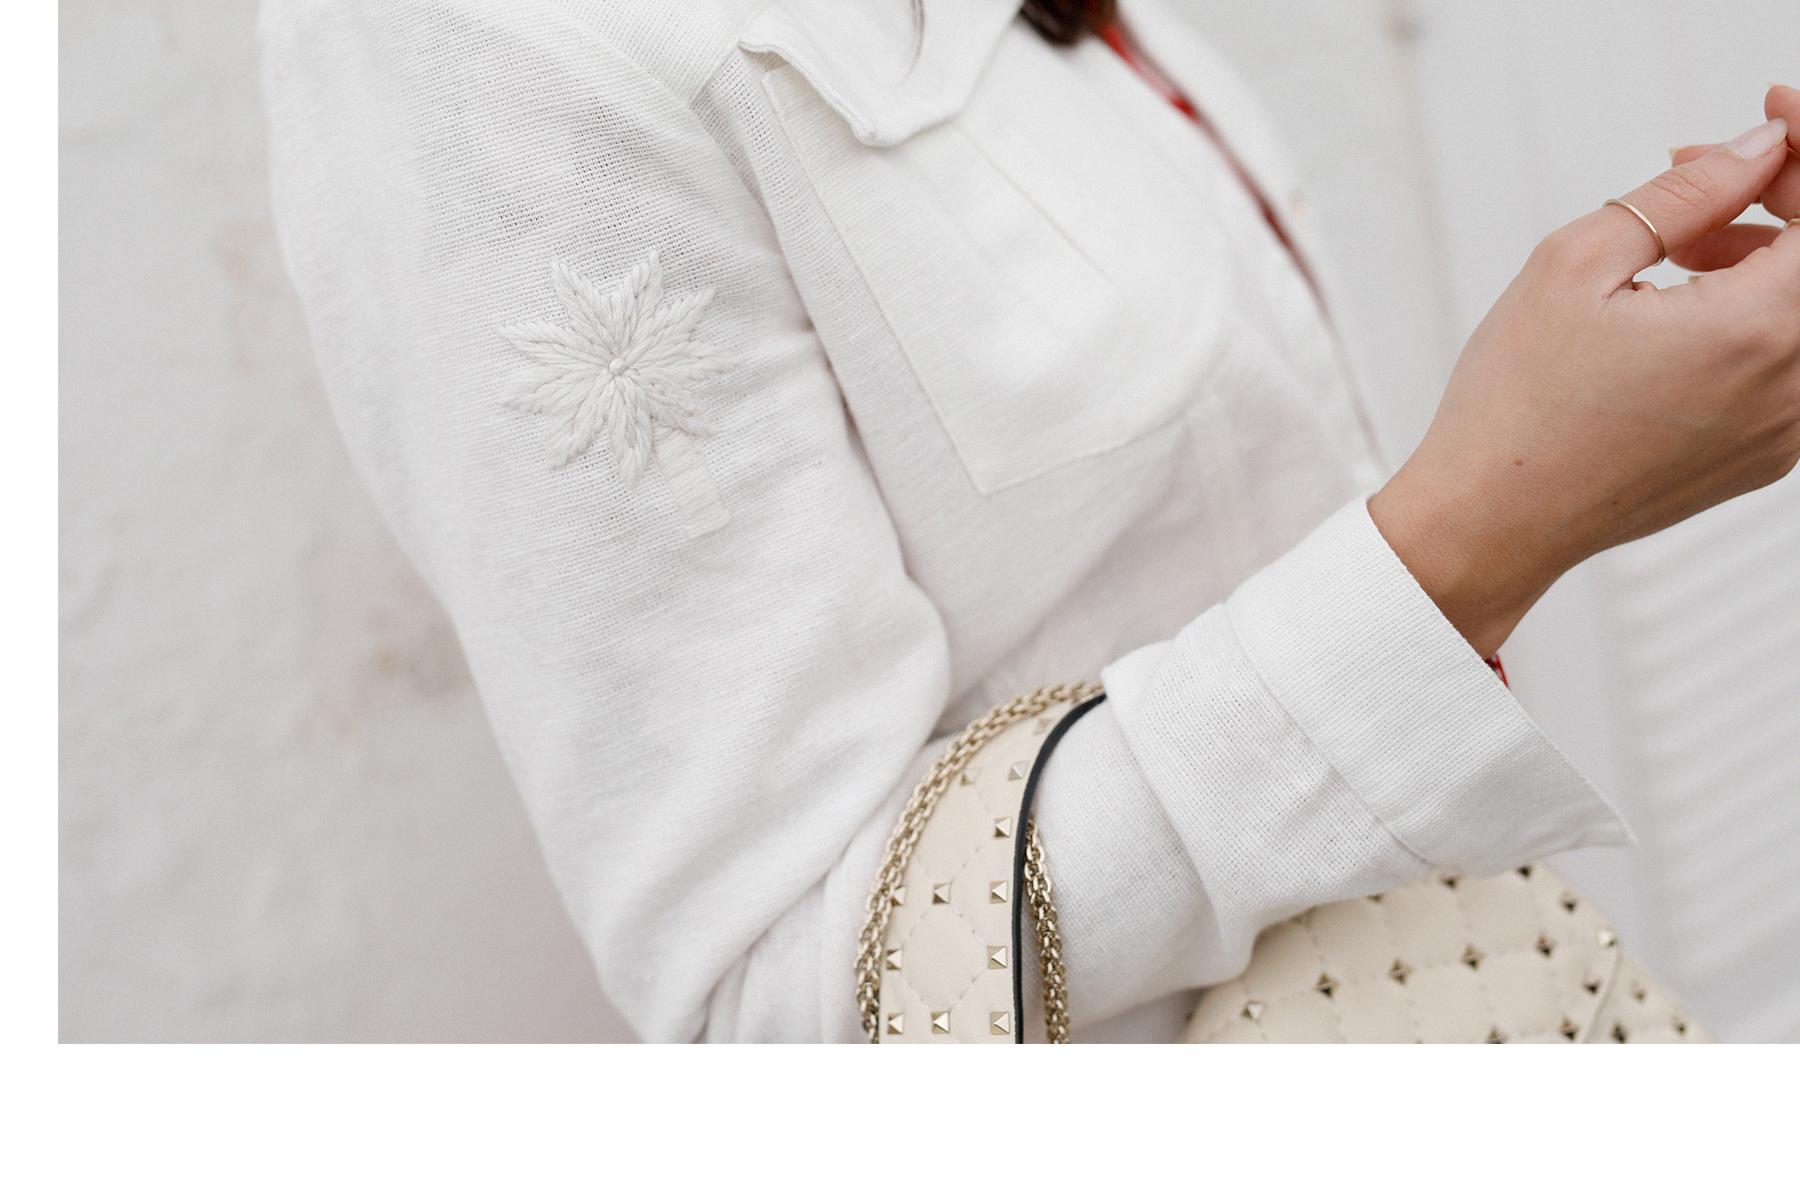 fabienne chapot lobster shirt slippers red white style mallorca cala d'or spain summer fashion spring 2018 modeblog modeblogger catsanddogsblog ricarda schernus styleblogger german fashionbloggers max bechmann fotografie düsseldorf 4